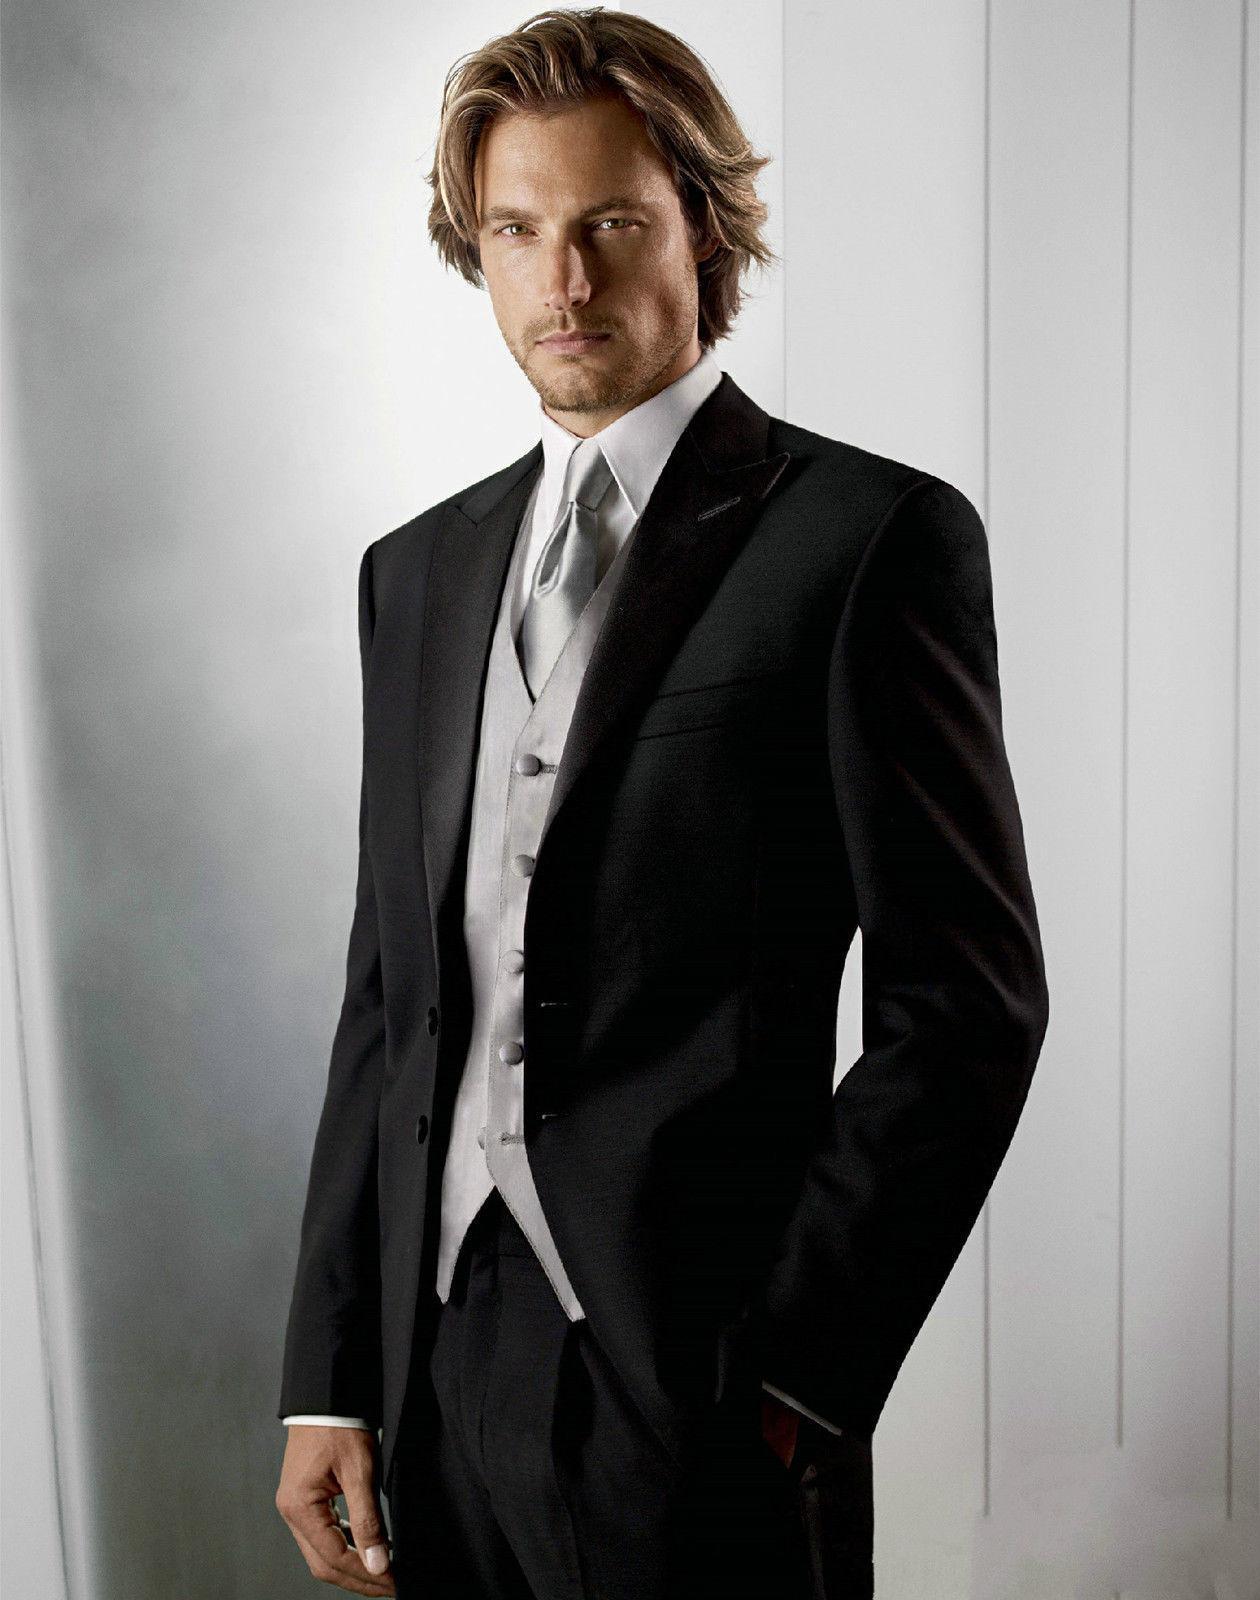 trajes para hombre mens white suits for weddings  wedding costume men BM529Одежда и ак�е��уары<br><br><br>Aliexpress